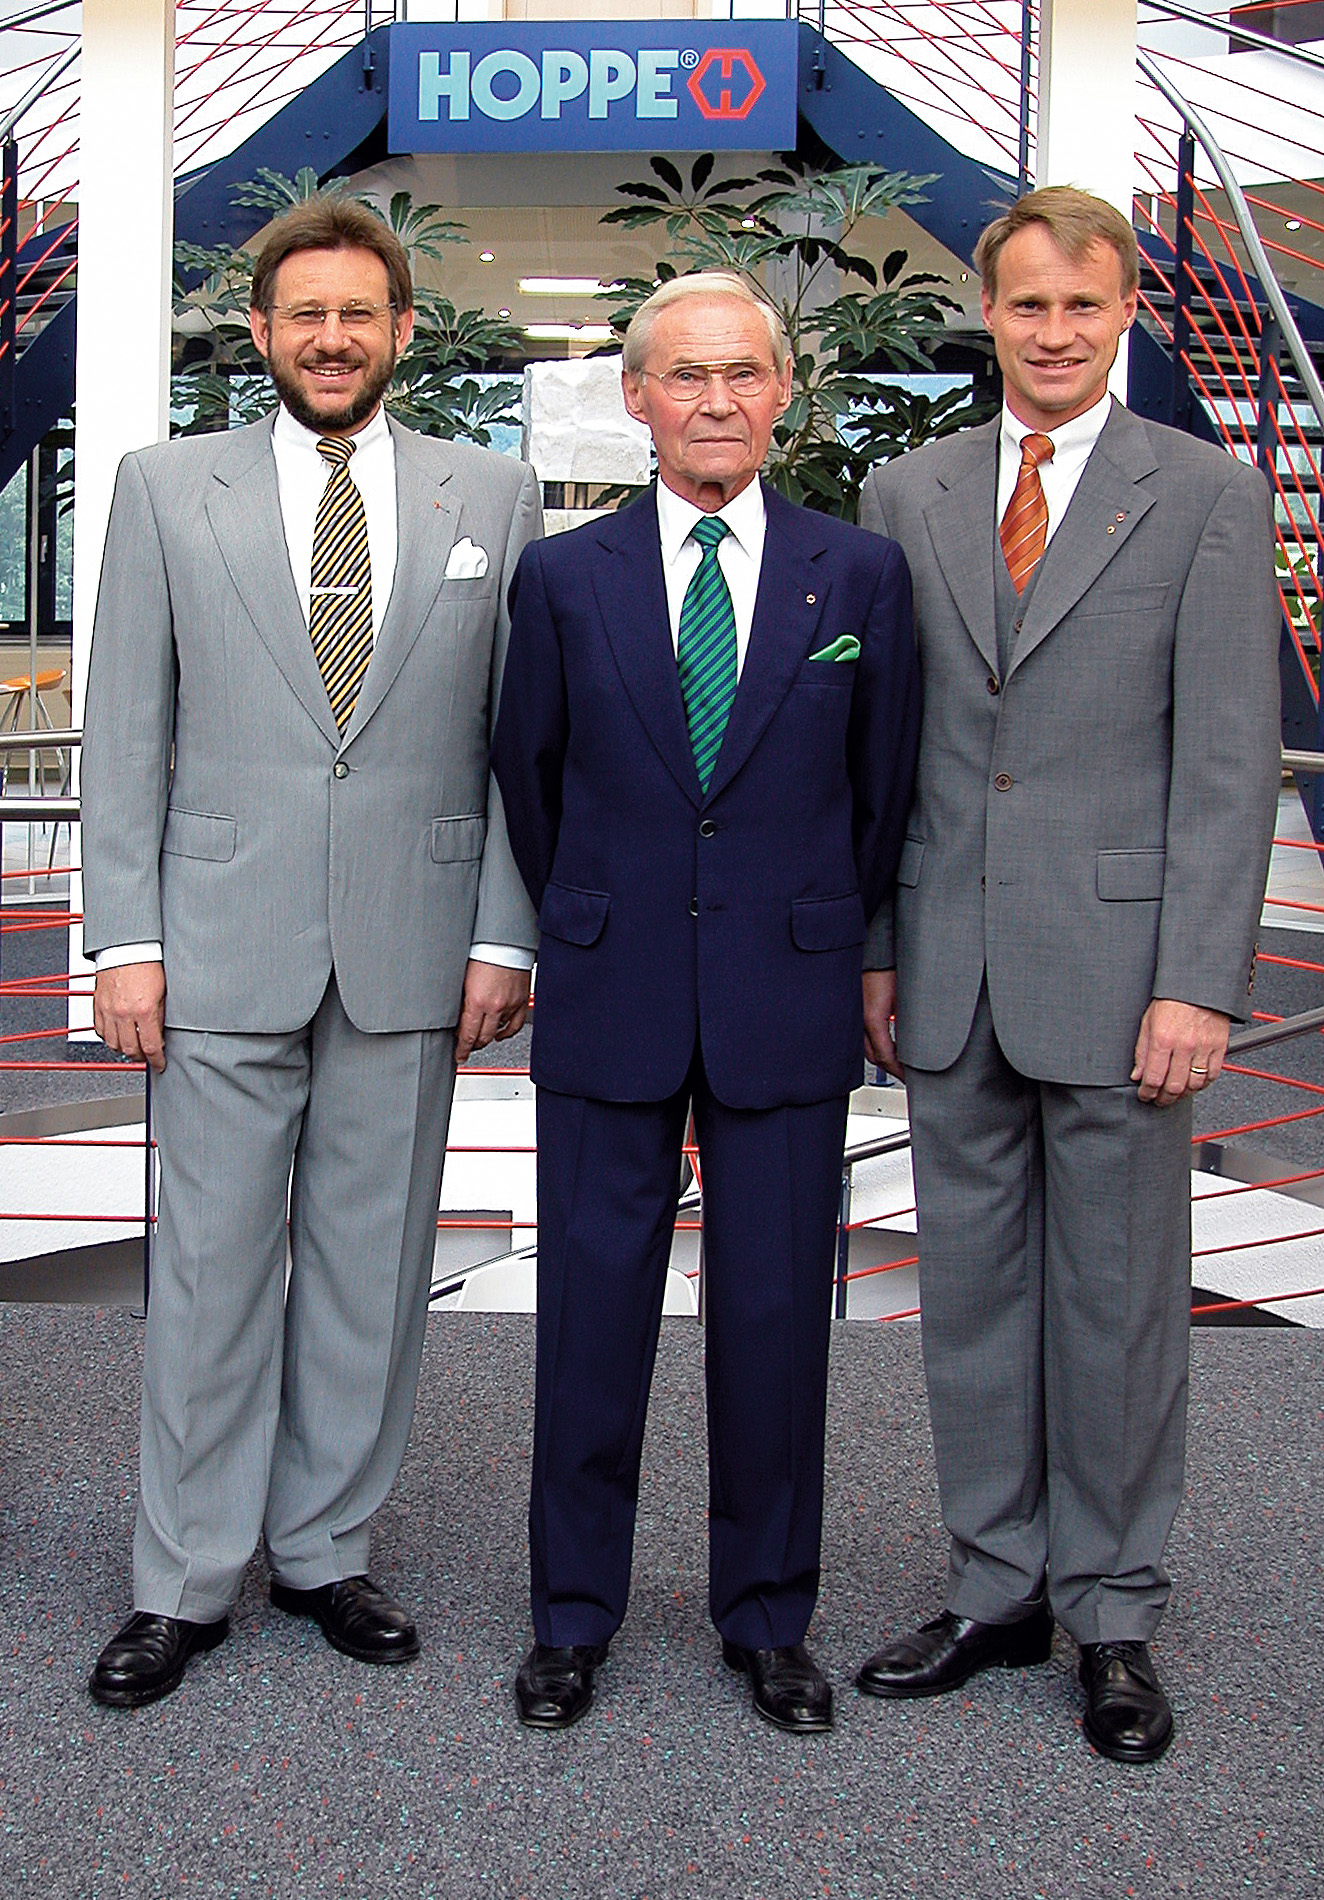 2002: Friedrich Hoppe (midden) en zijn zonen Wolf (links) en Christoph Hoppe (rechts)